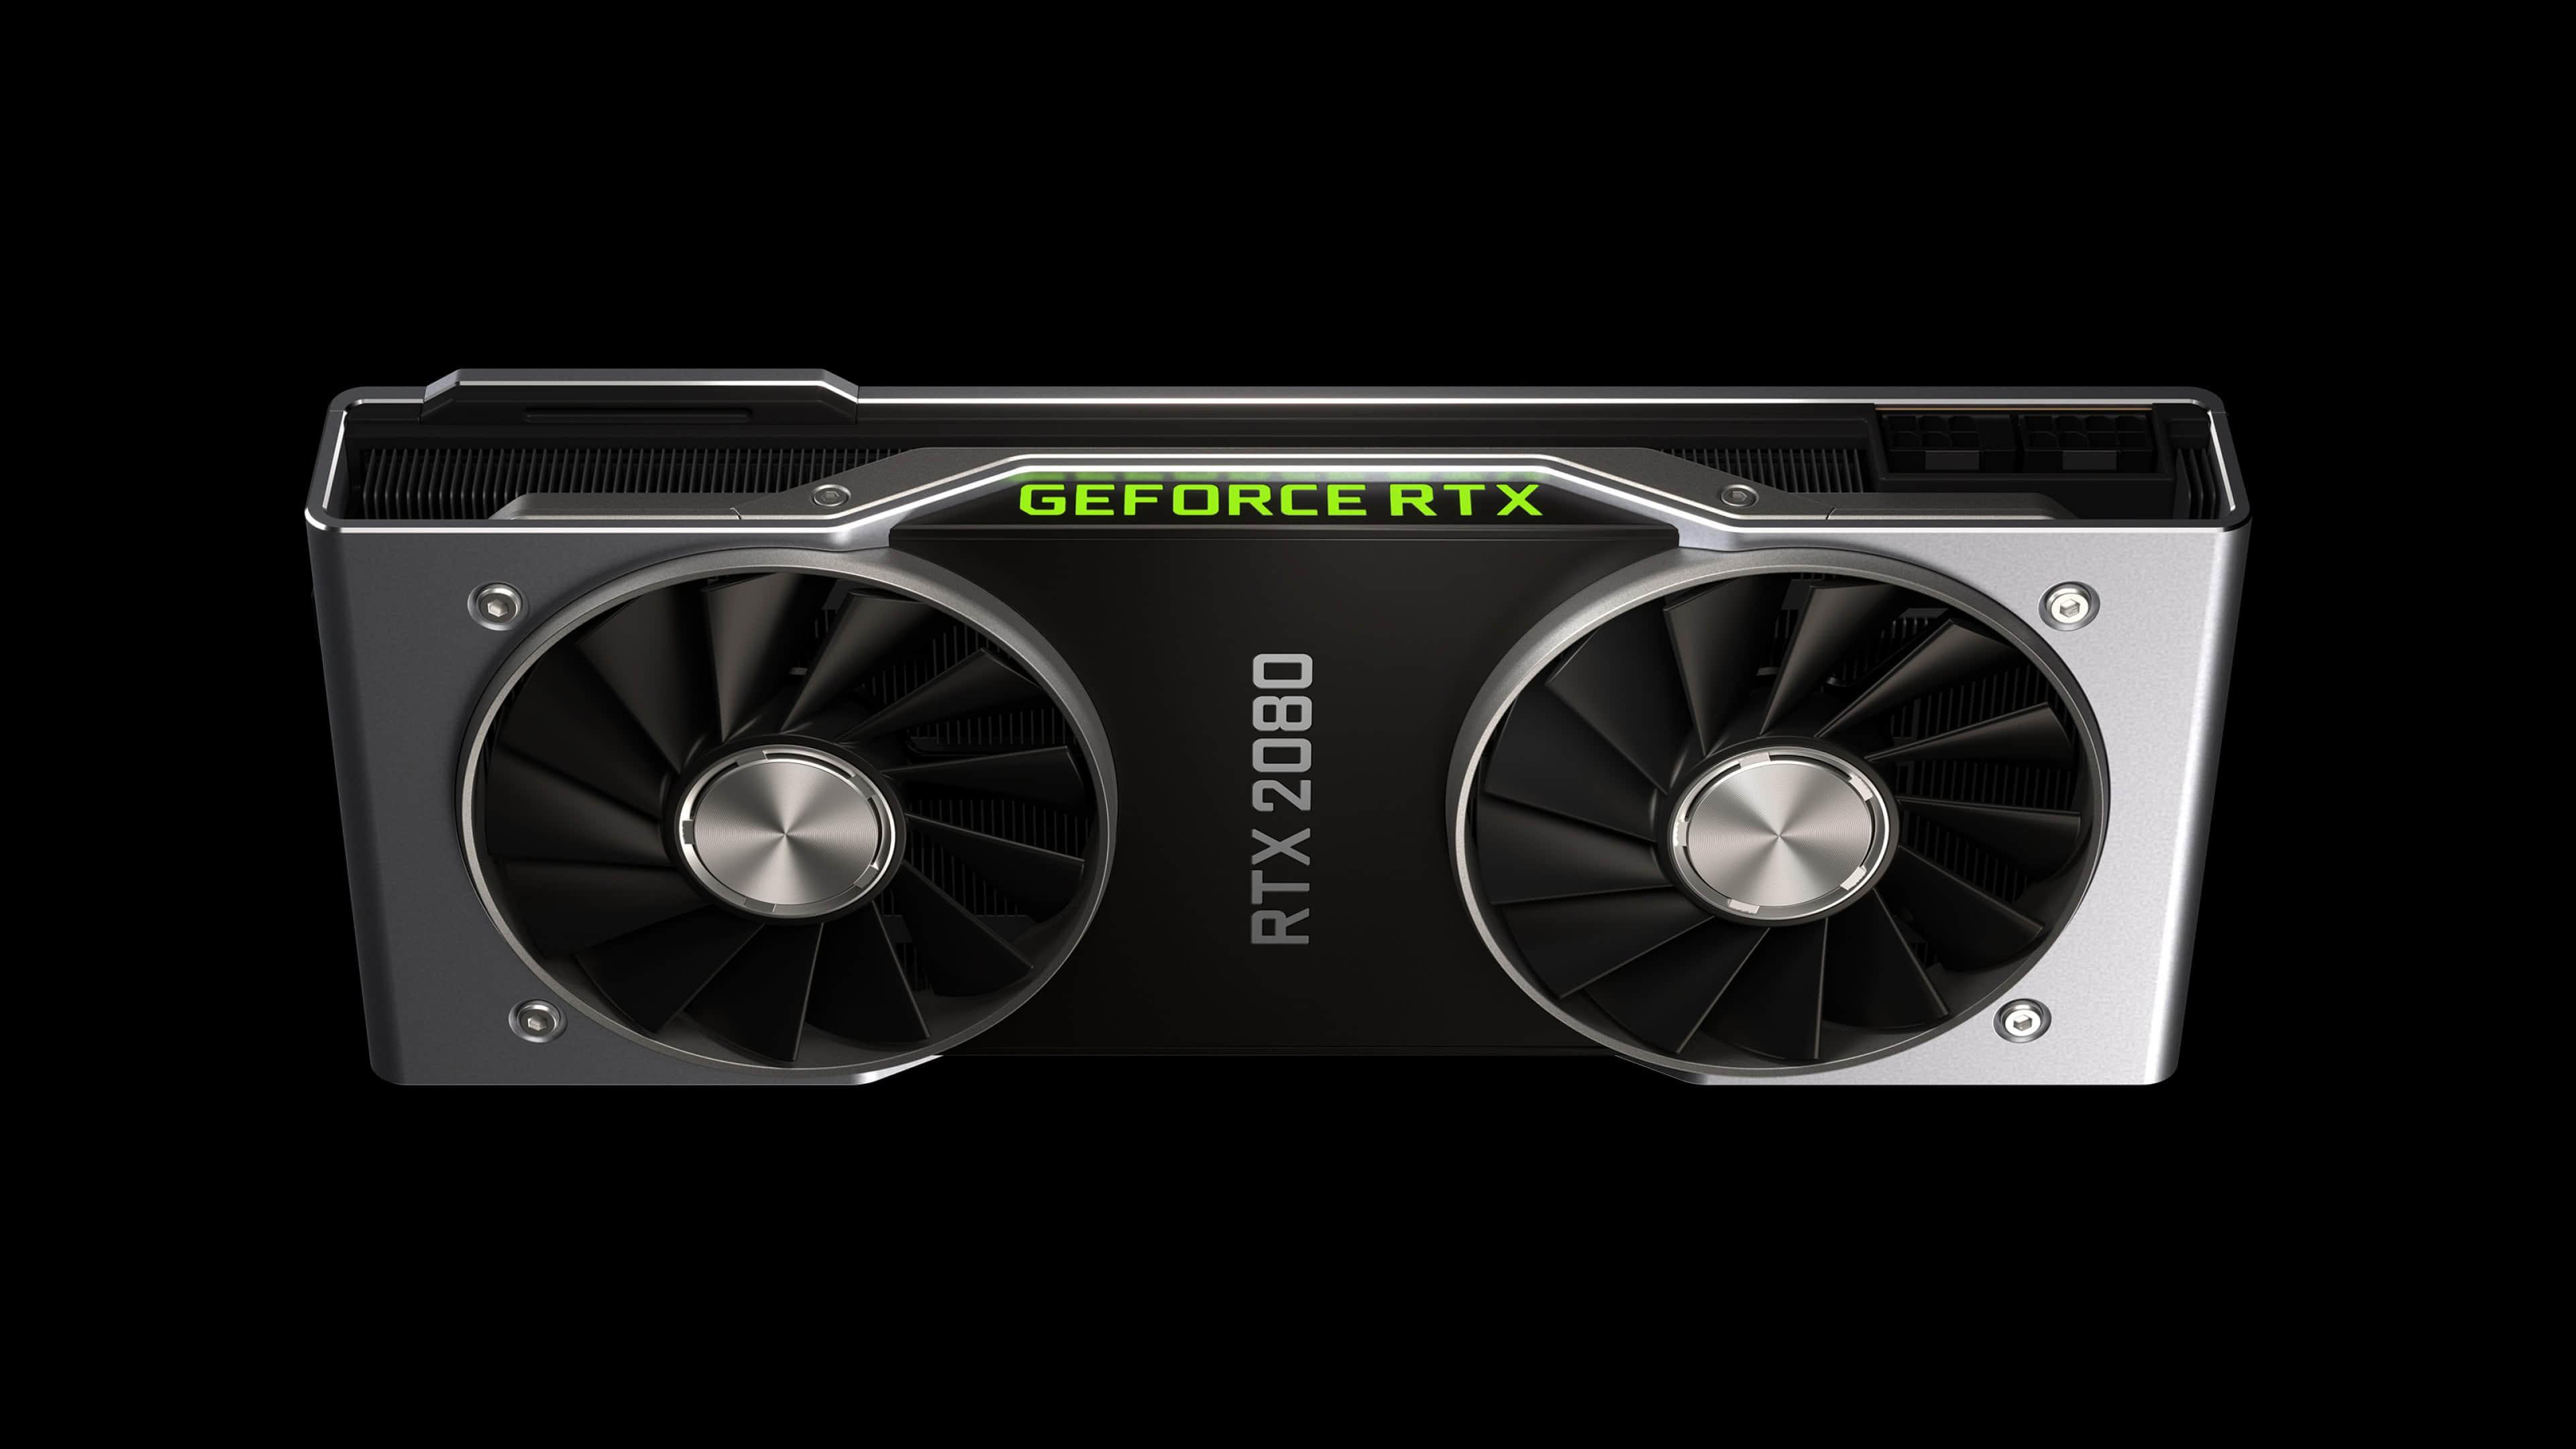 Nvidia Geforce RTX 2080 UHD 4K Wallpaper Pixelz 3840x2160